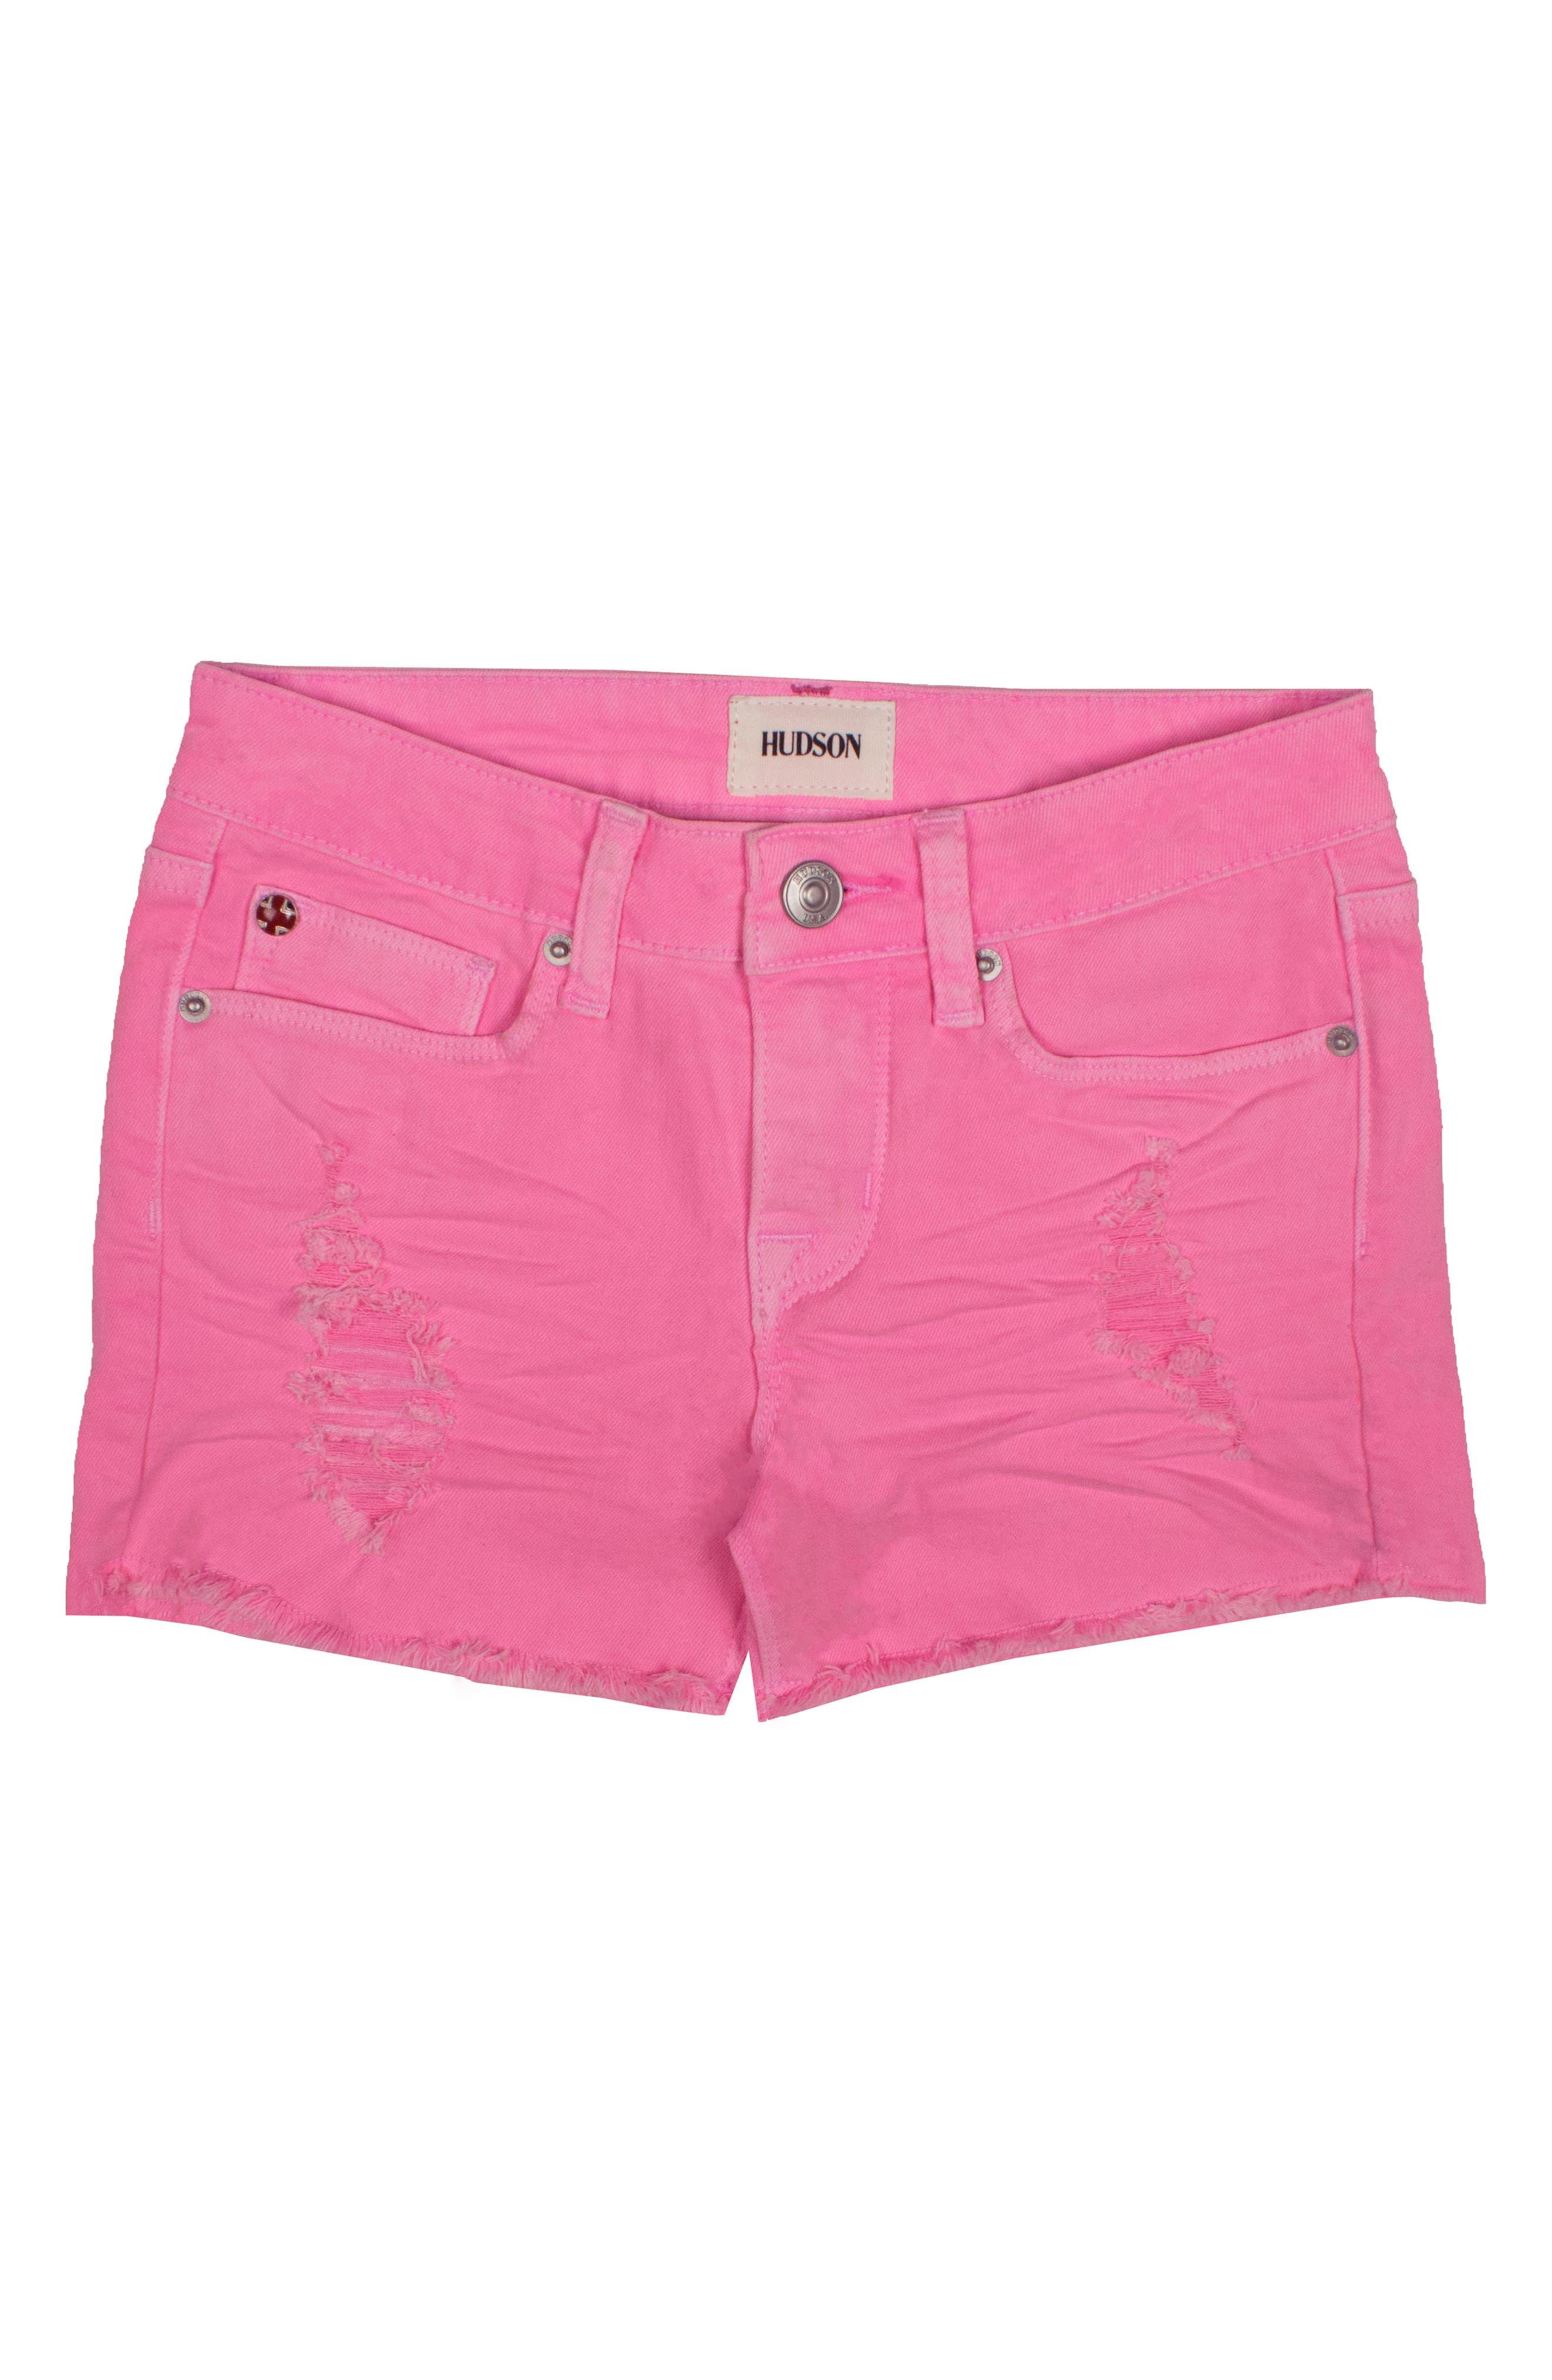 Hudson Kids Ava Shorts (Baby Girls)